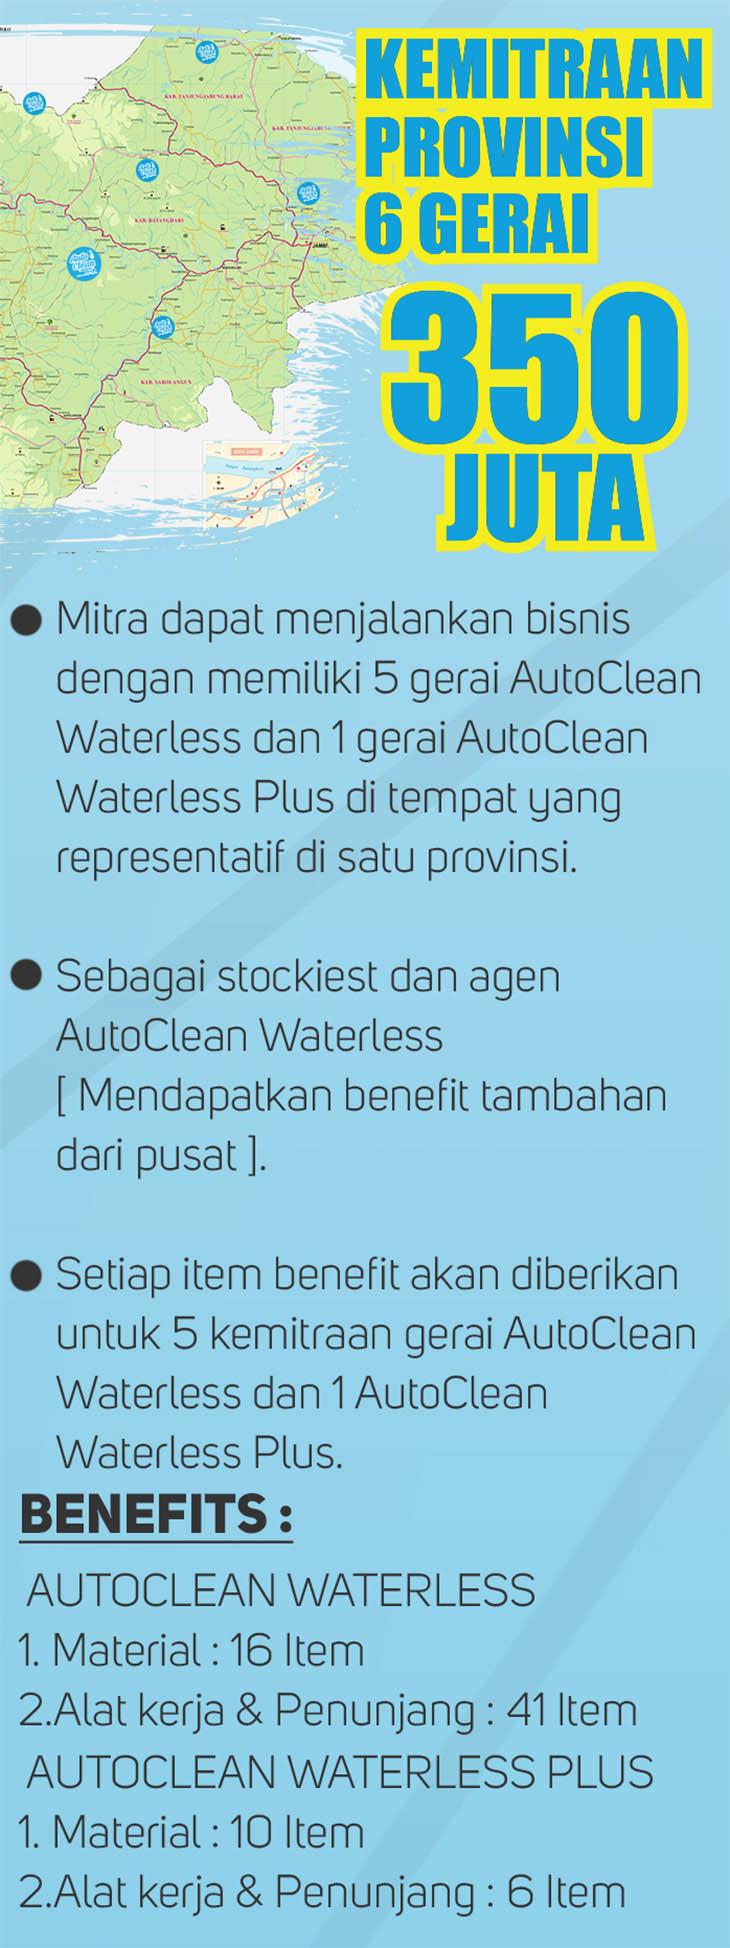 Franchise Peluang Usaha AutoClean Waterless